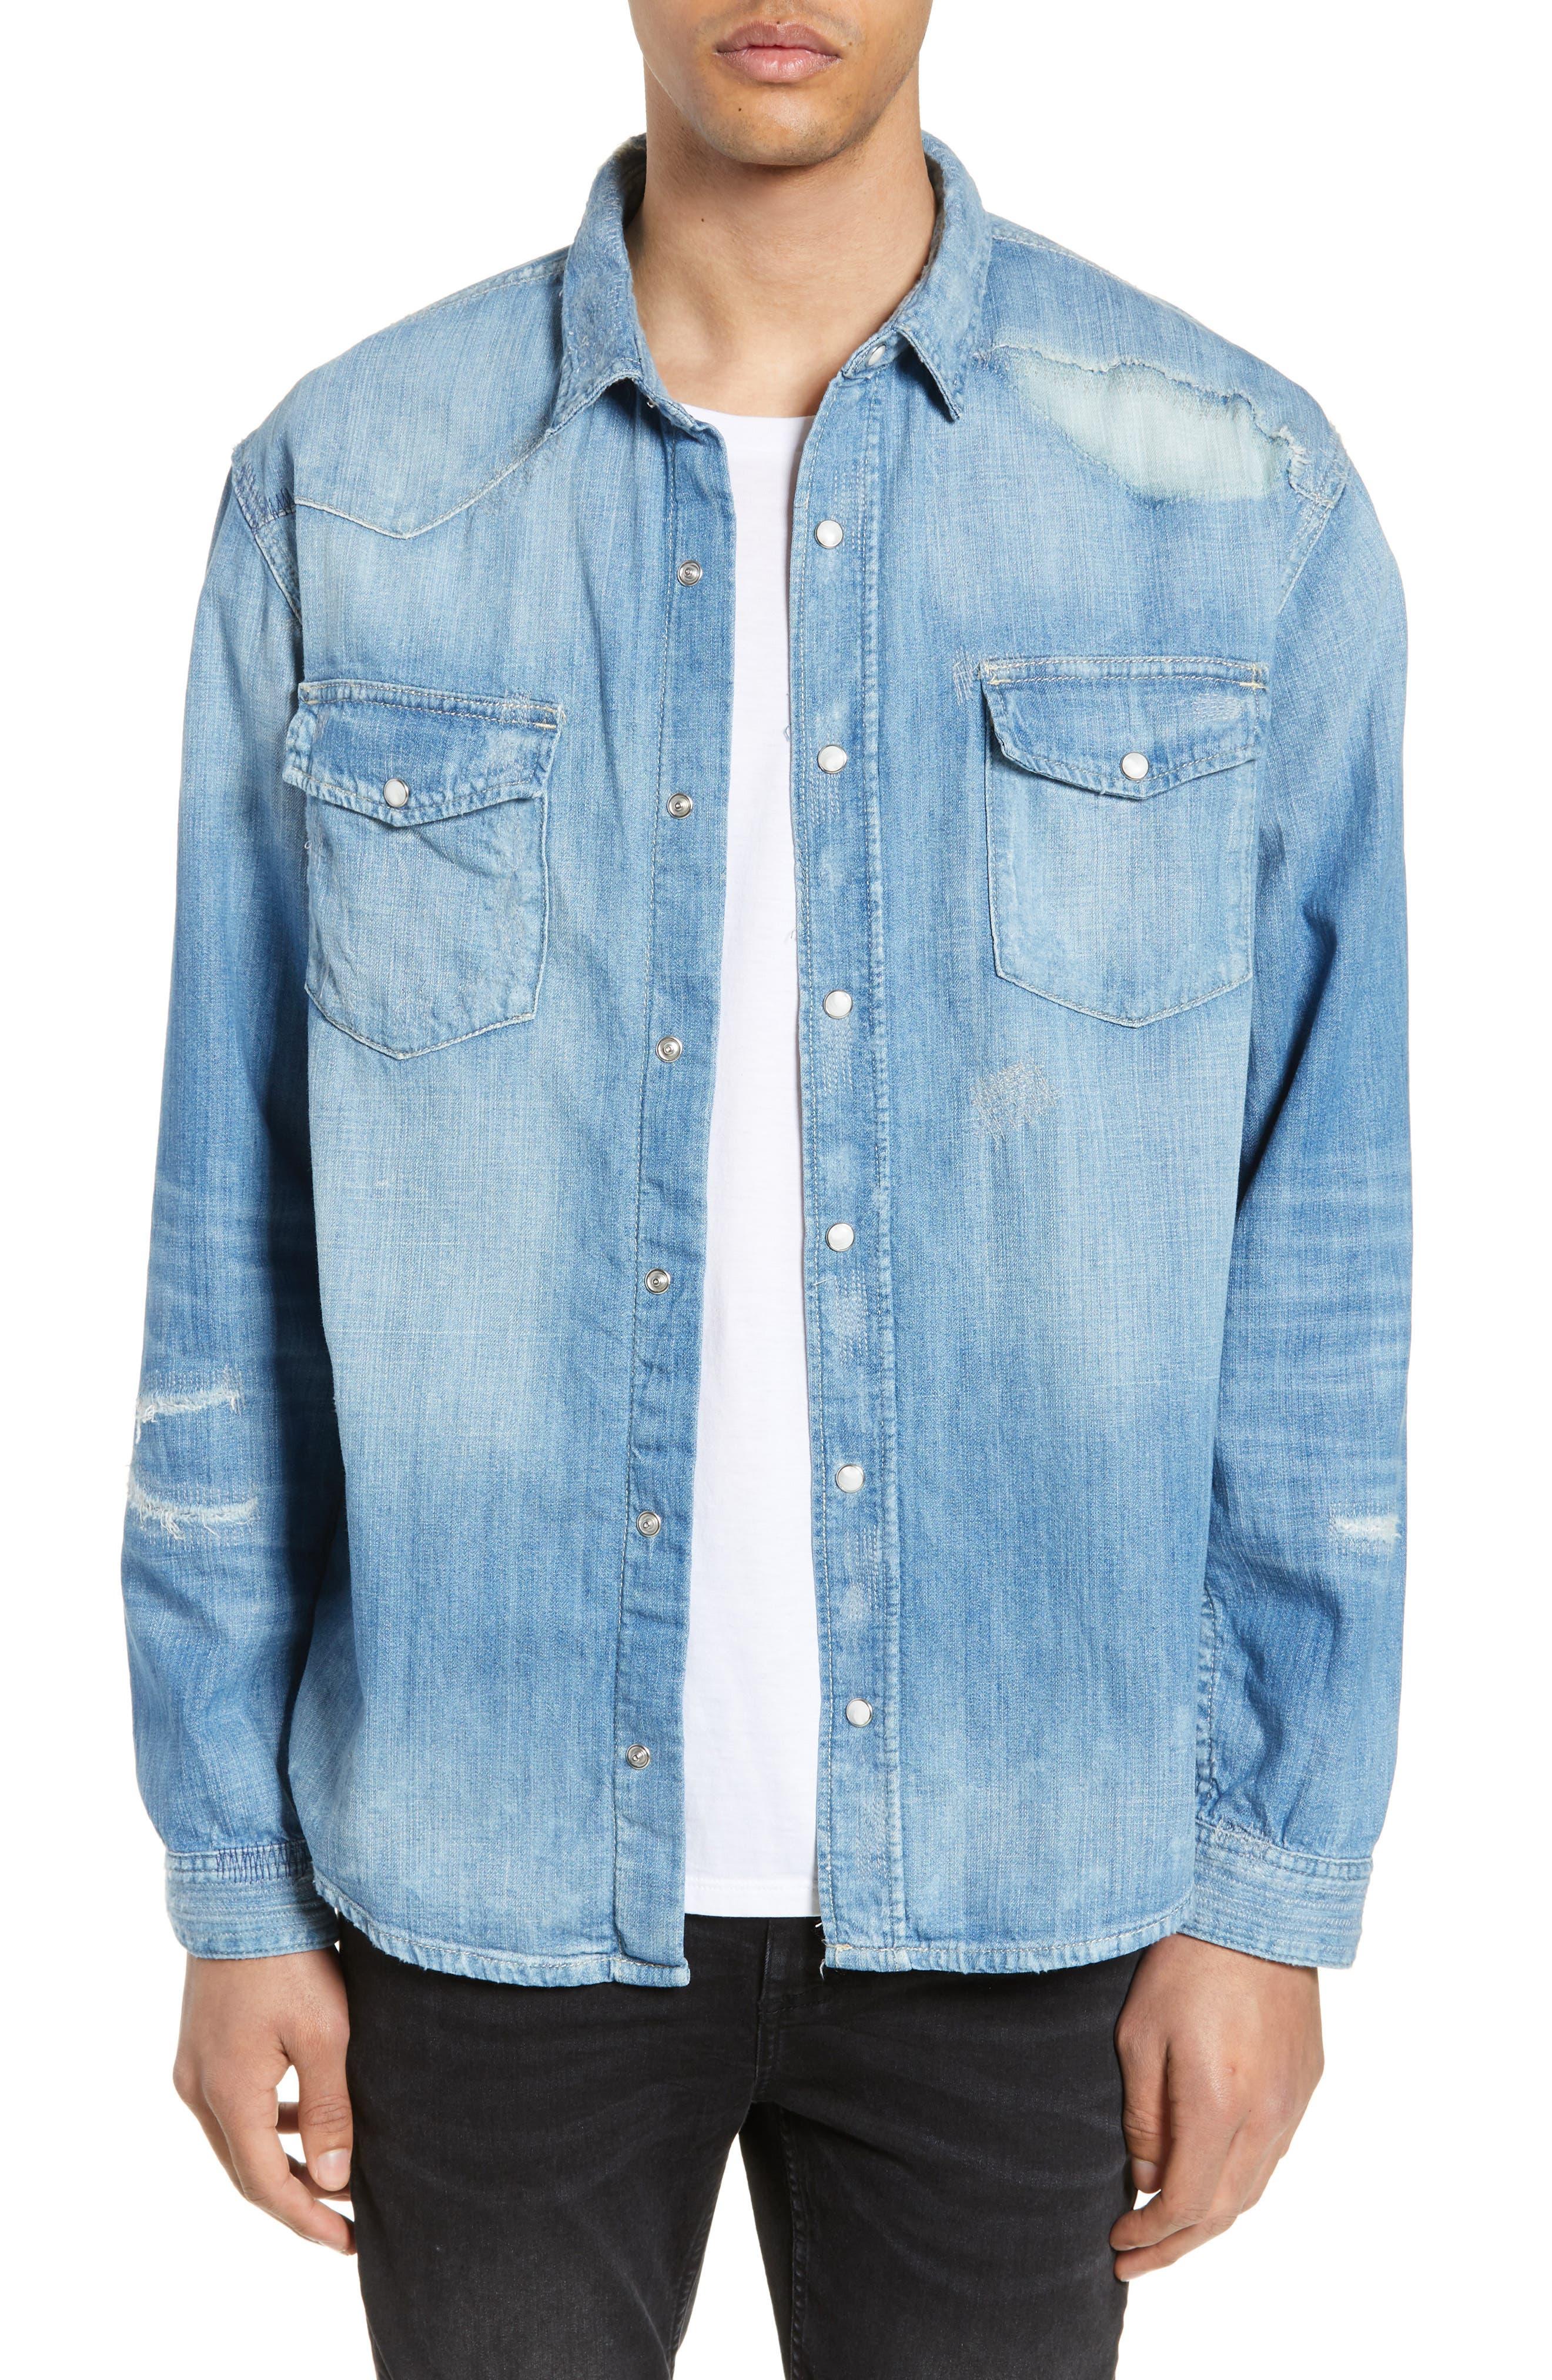 THE KOOPLES Ripped Denim Shirt, Main, color, BLUE DENIM